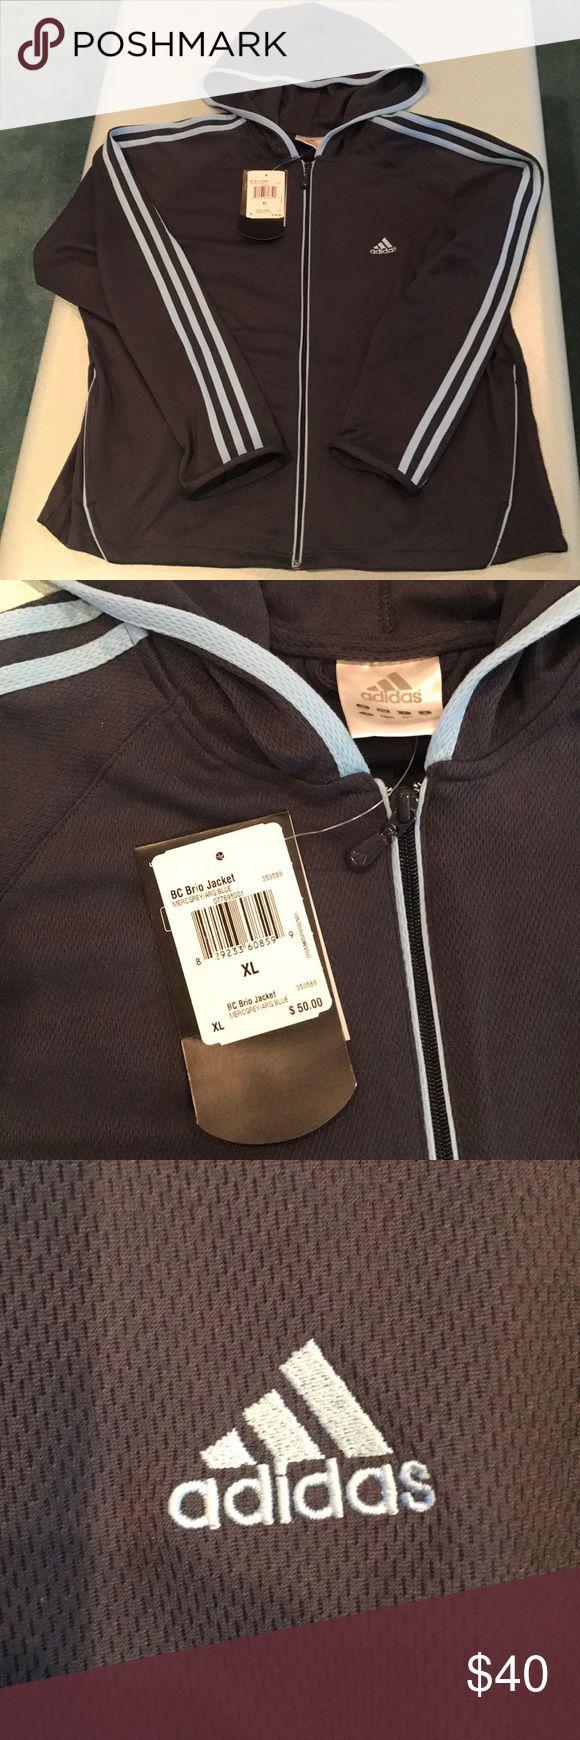 Adidas Grey Brio Jacket with Hood Brand New Adidas Jacket Lightweight . Very Comfortable . adidas Jackets & Coats